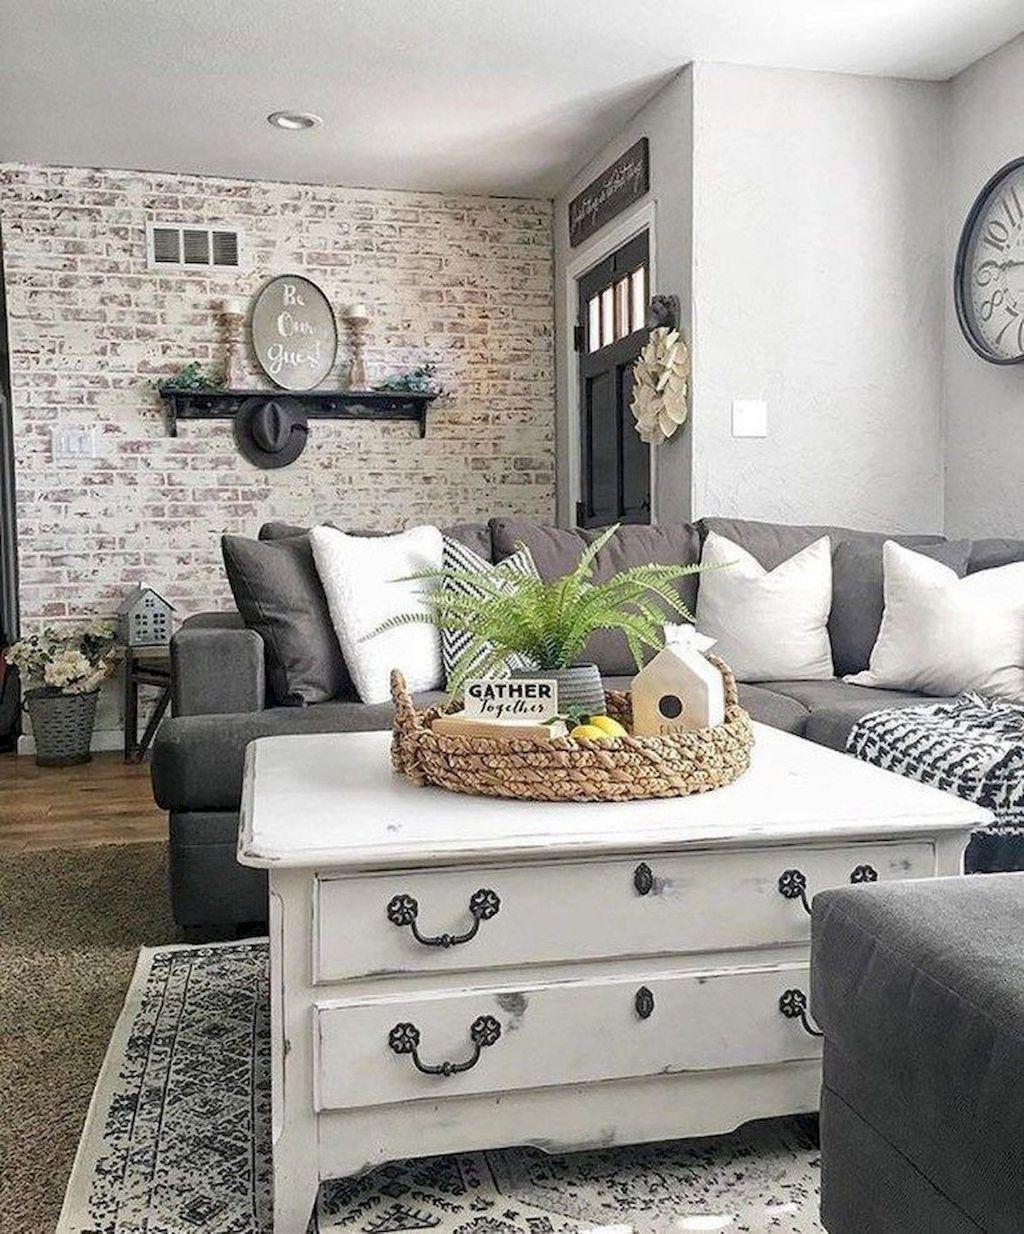 65 Modern Farmhouse Living Room Makeover Decor Ideas #modernfarmhouselivingroom